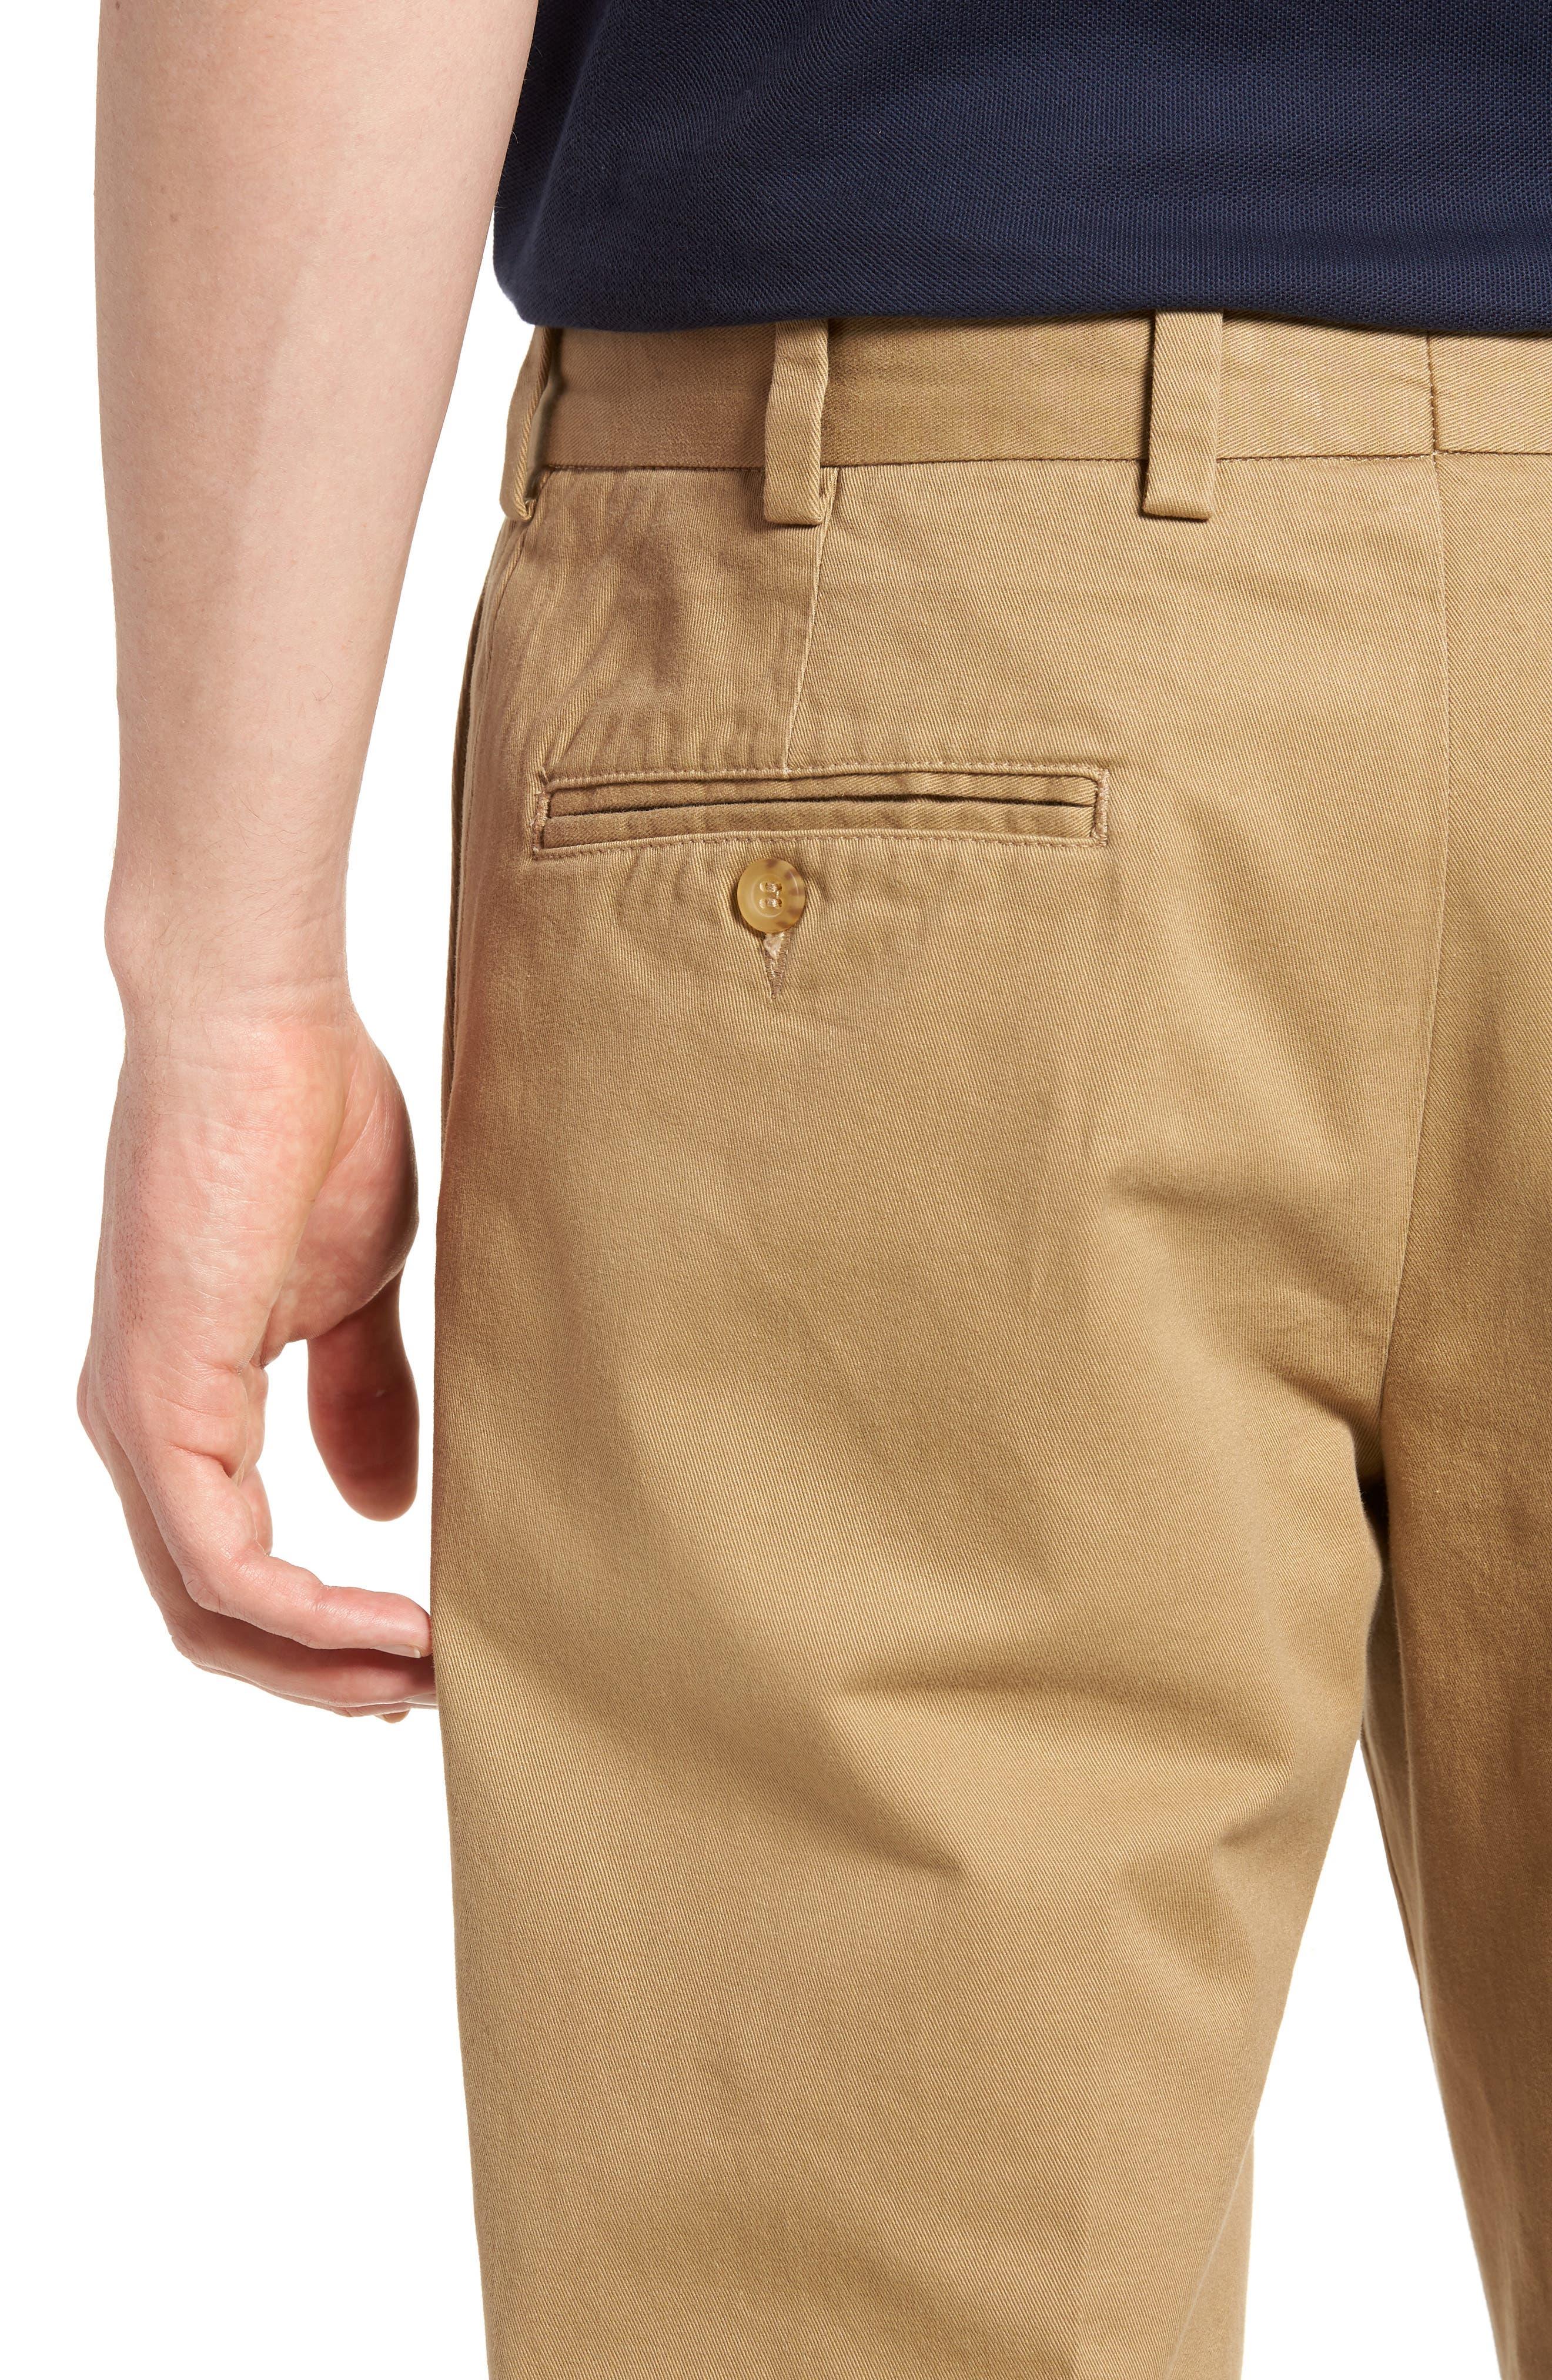 M3 Straight Fit Vintage Twill Flat Front Pants,                             Alternate thumbnail 4, color,                             British Khaki